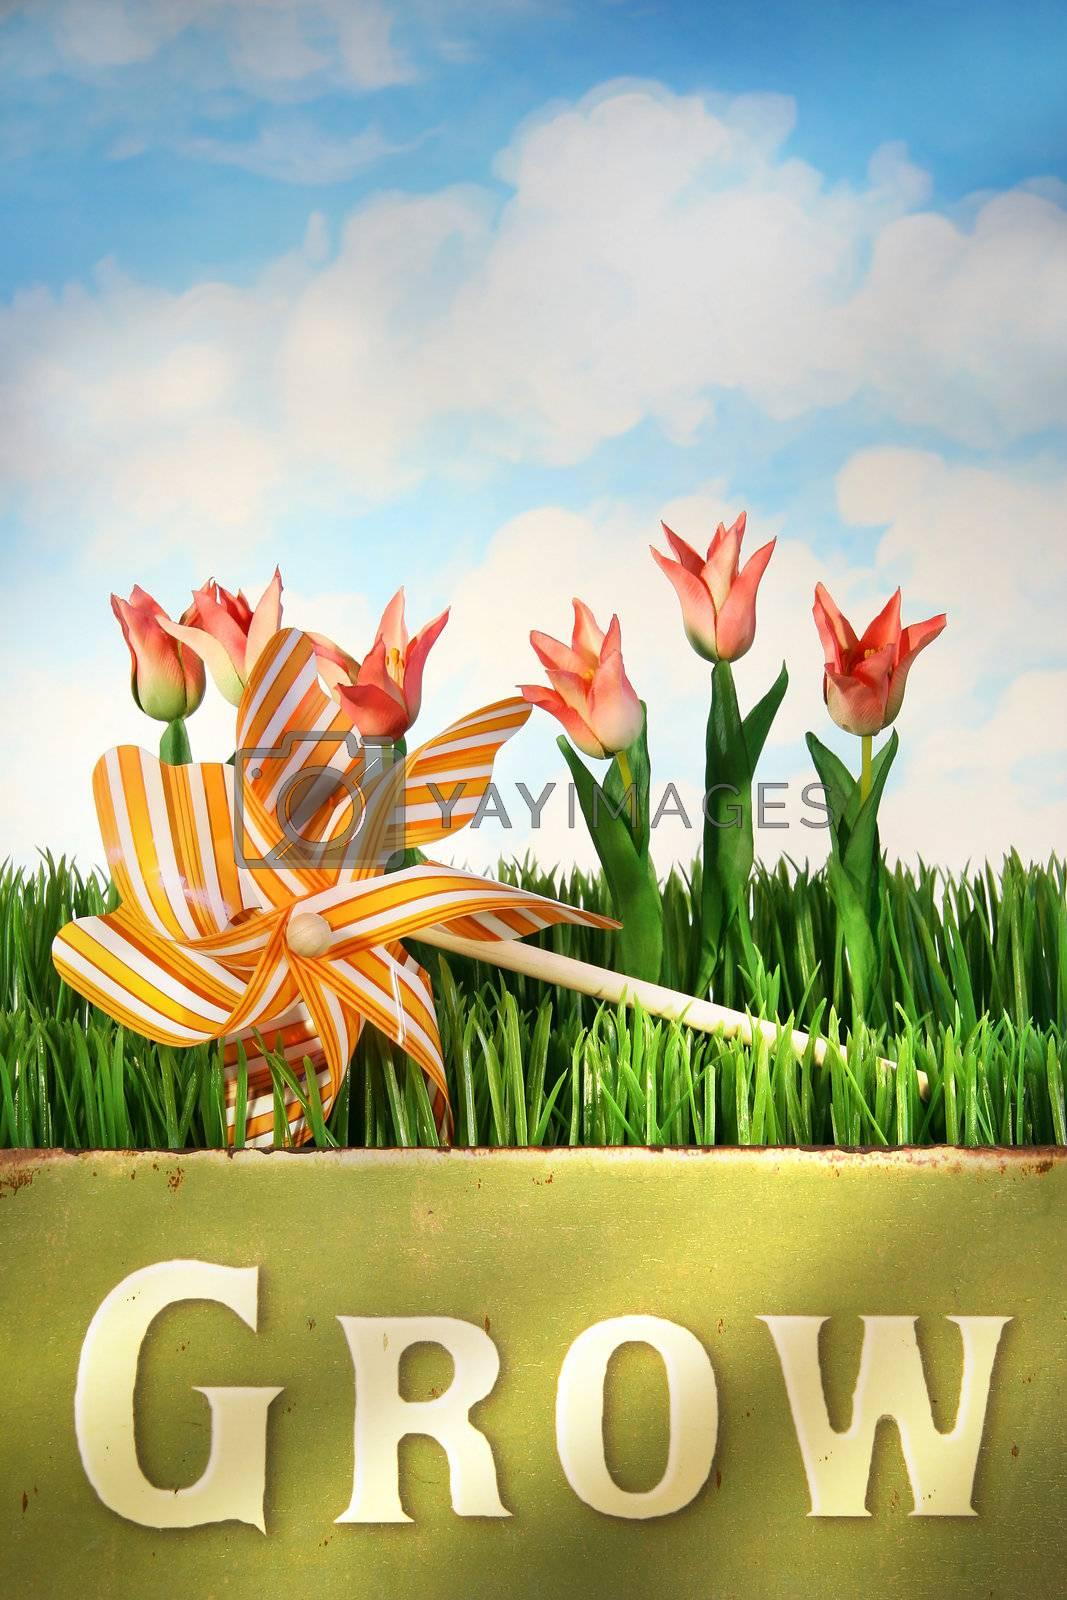 Springtime fun/ Concept theme for spring and summer designs